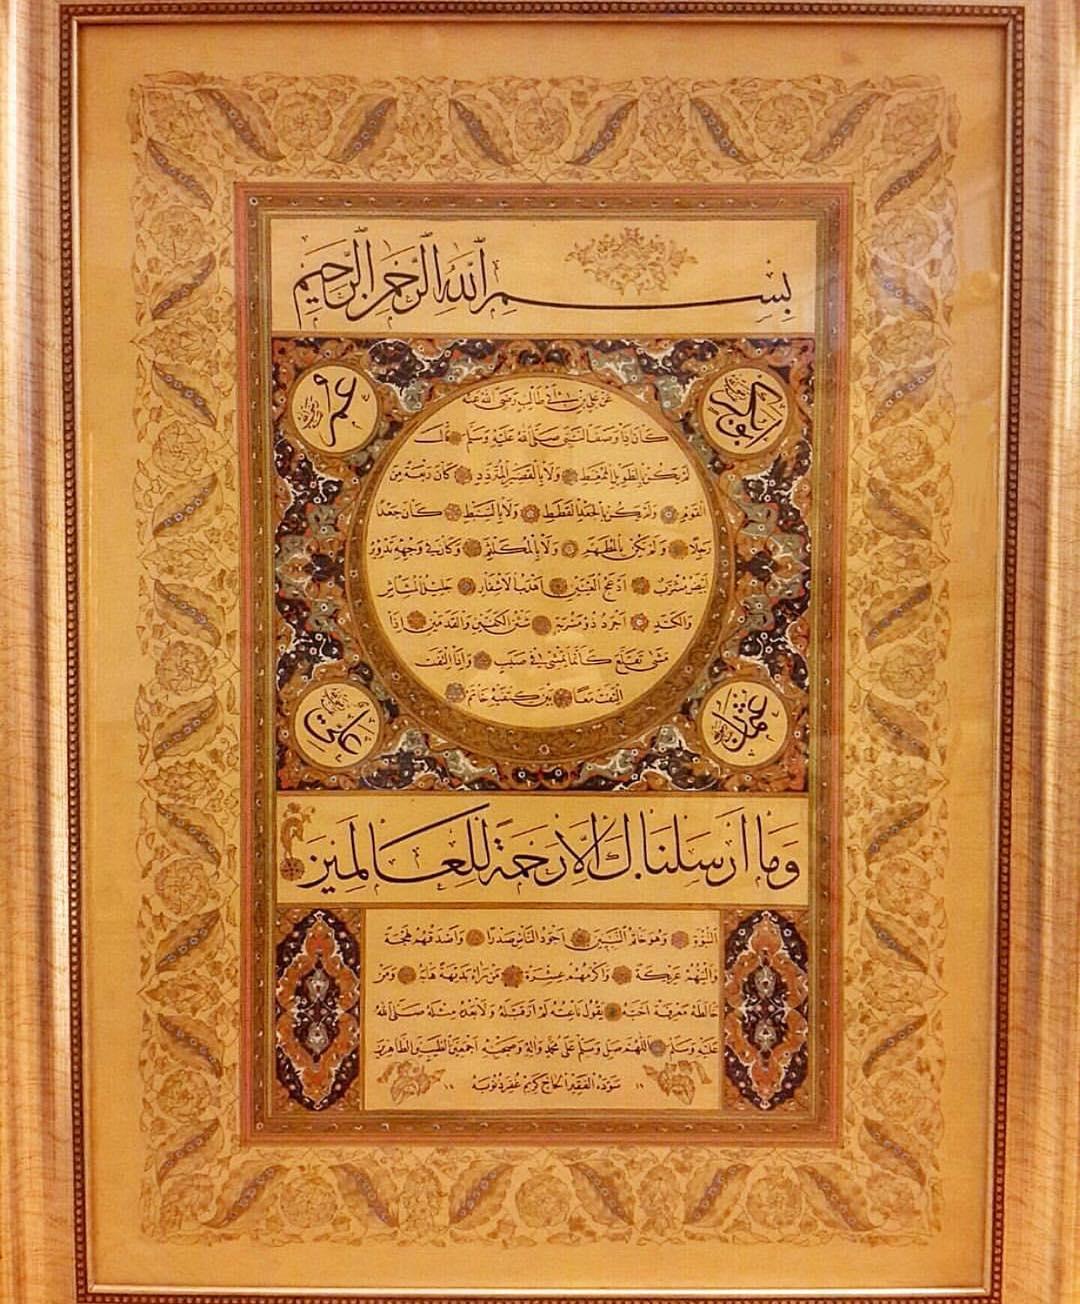 Professional Calligrapher Bijar Arbilly Calligraphy  حلية قديمة بناريخ ١٤١٦ اول حلية لي #calligraphy #kunst #art #bild #berlin #arbil… 166